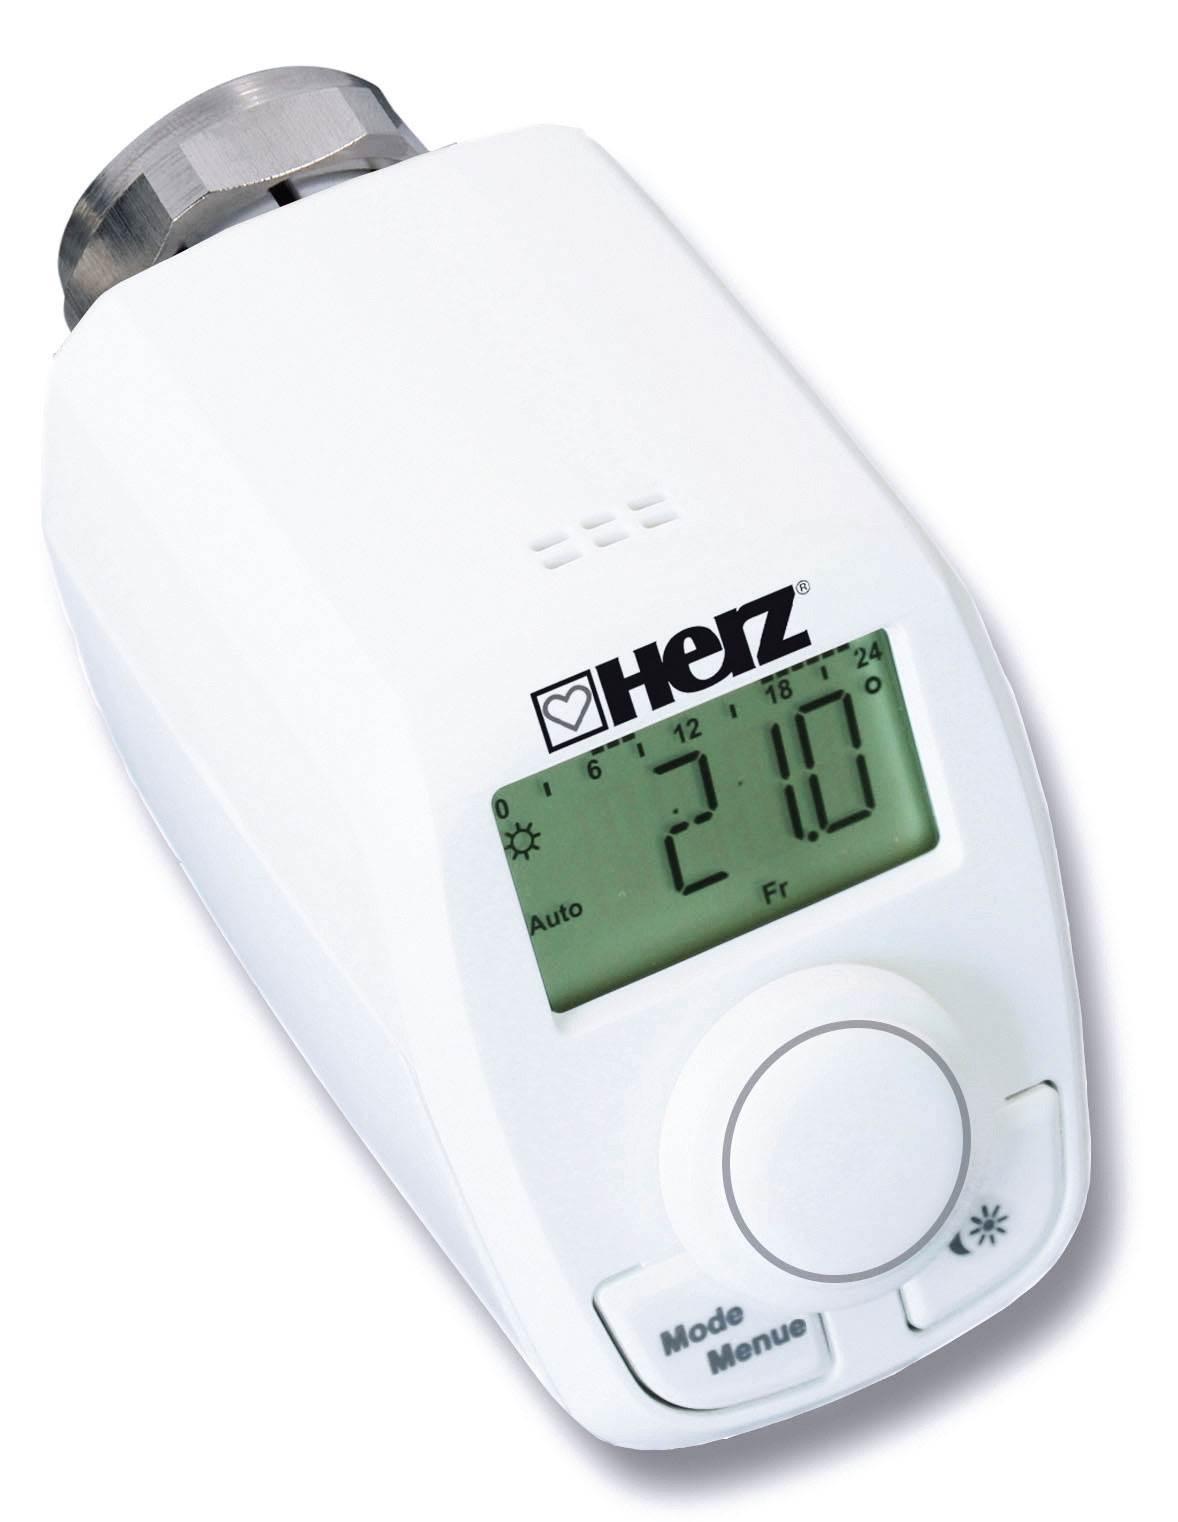 zawory termostatyczne1 - Zawory termostatyczne